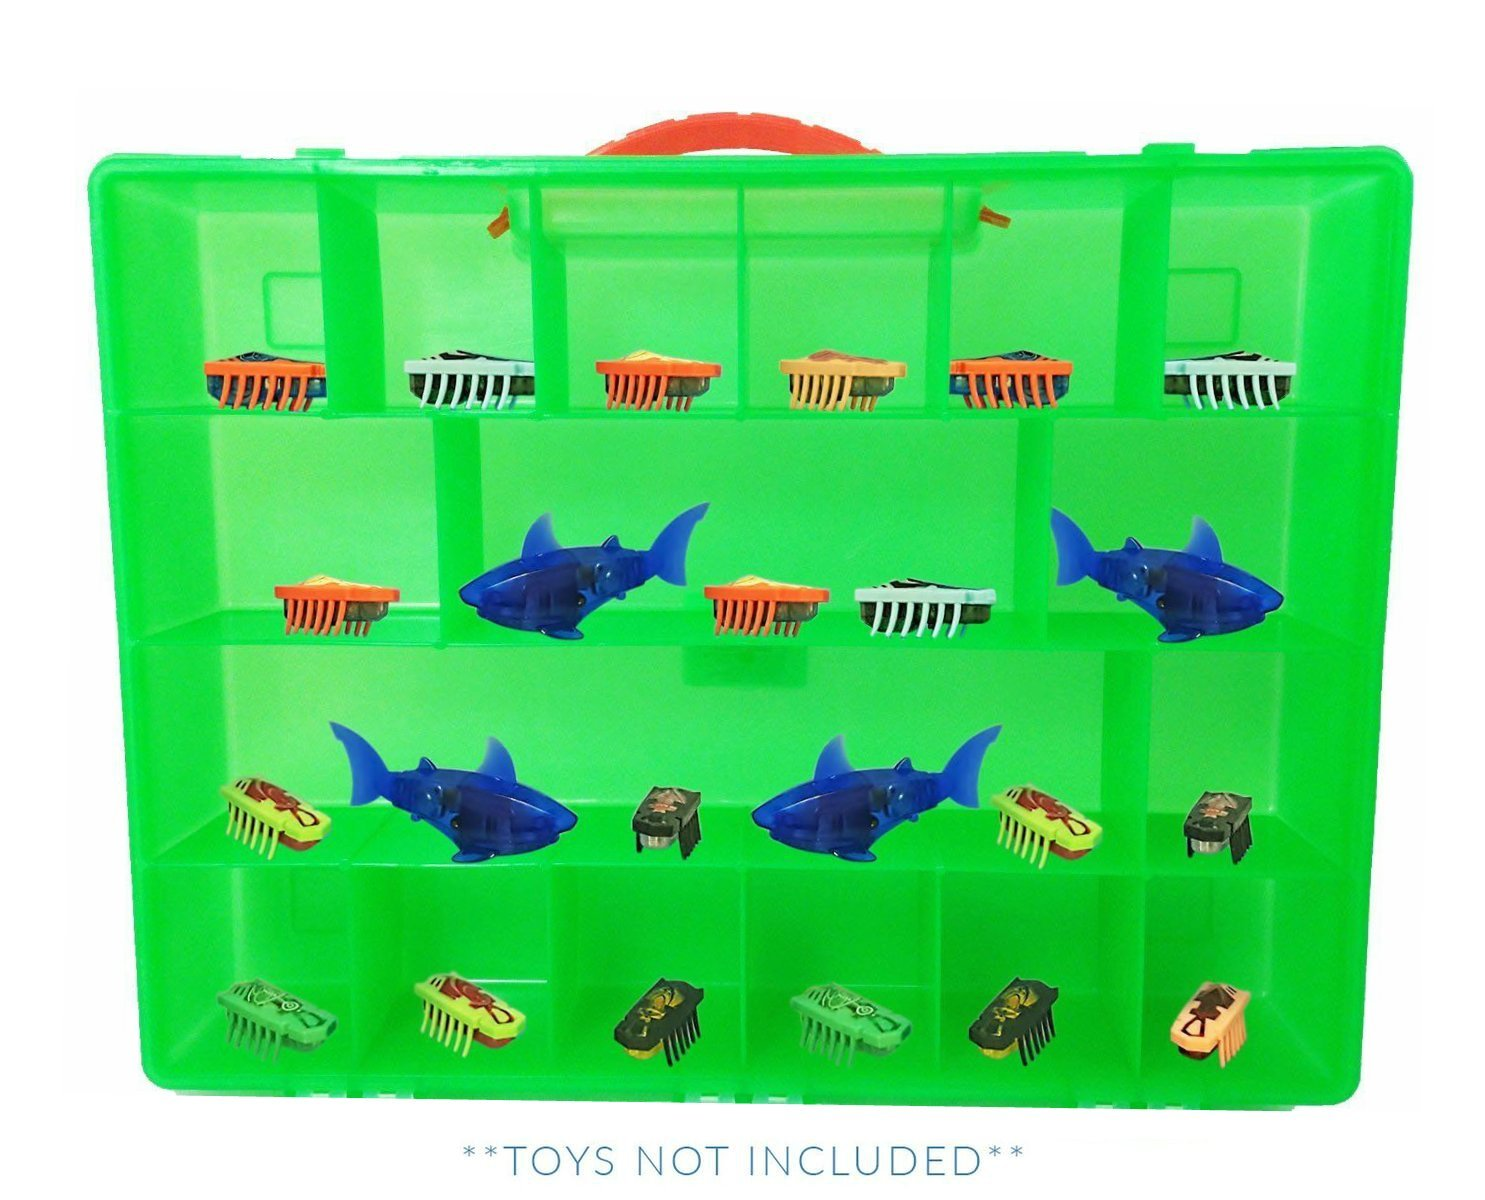 Life Made Better Hexbug Nano Case, Toy Storage Carrying Box. Figures Playset Organizer. Accessories Kids LMB LMB165